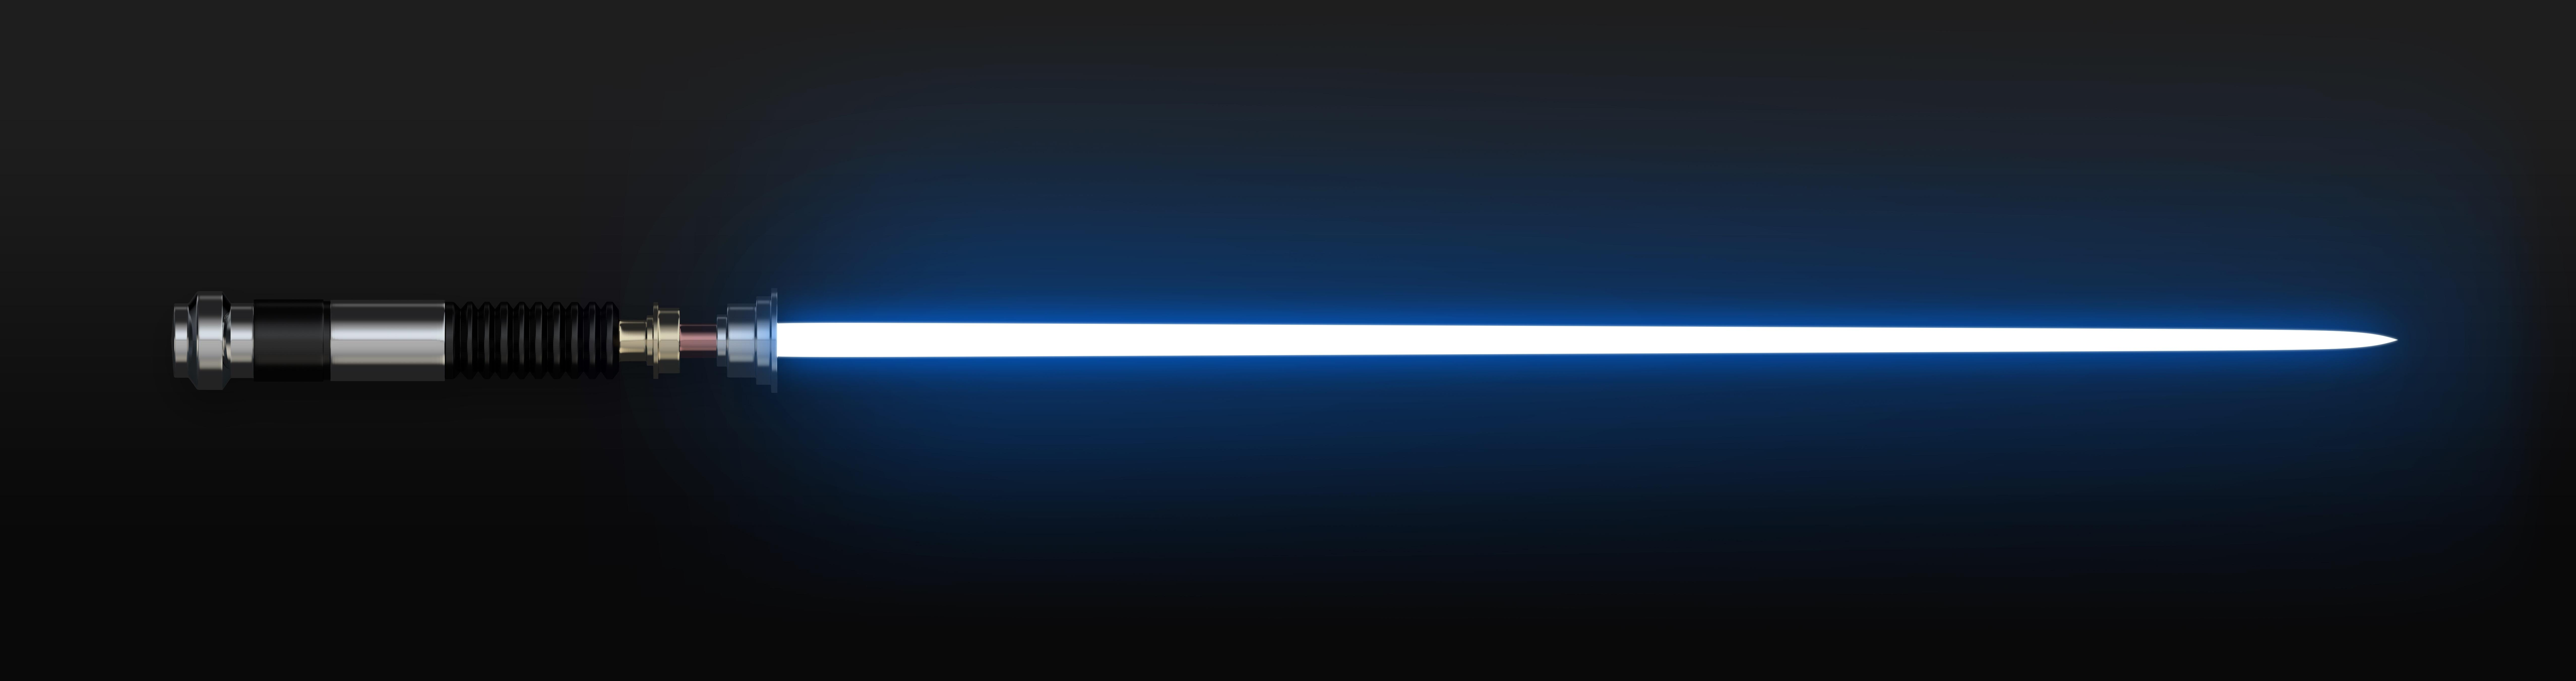 Lightsaber 4k Ultra HD Wallpaper Background Image 10220x2700 10220x2700